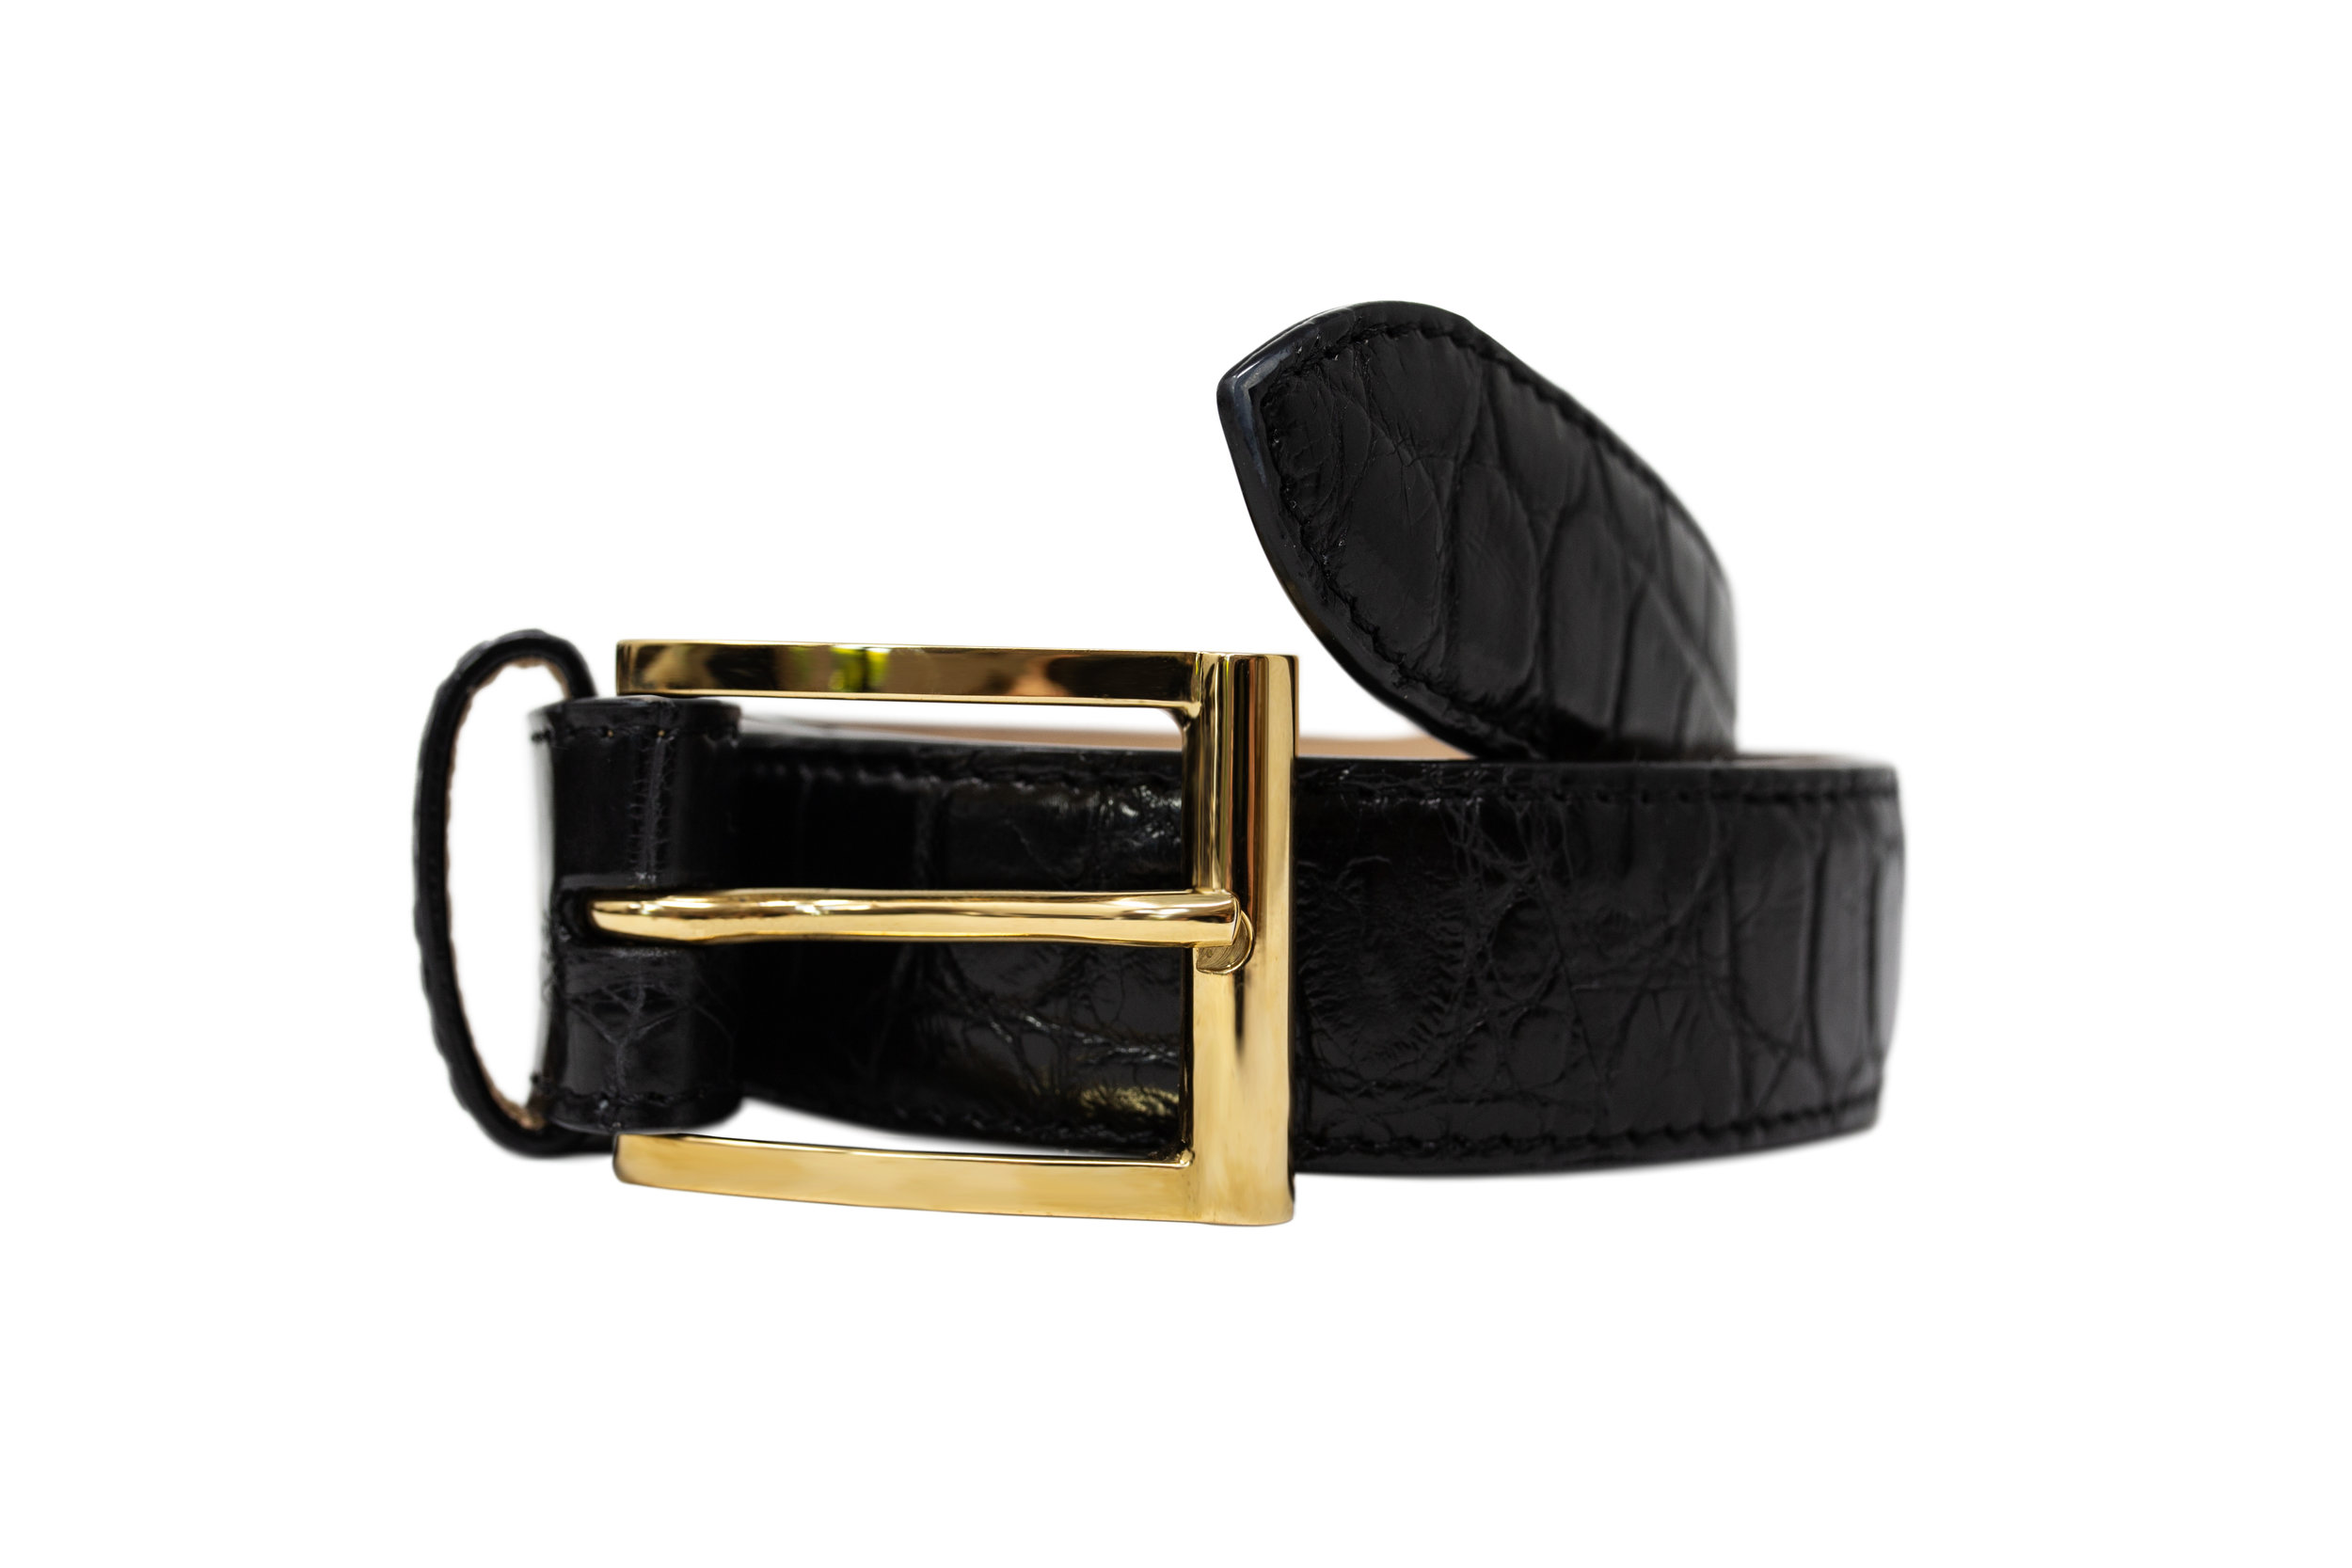 Calie Parese Luxury Crocodile Belt handcrafted from a single piece of Nile crocodile.